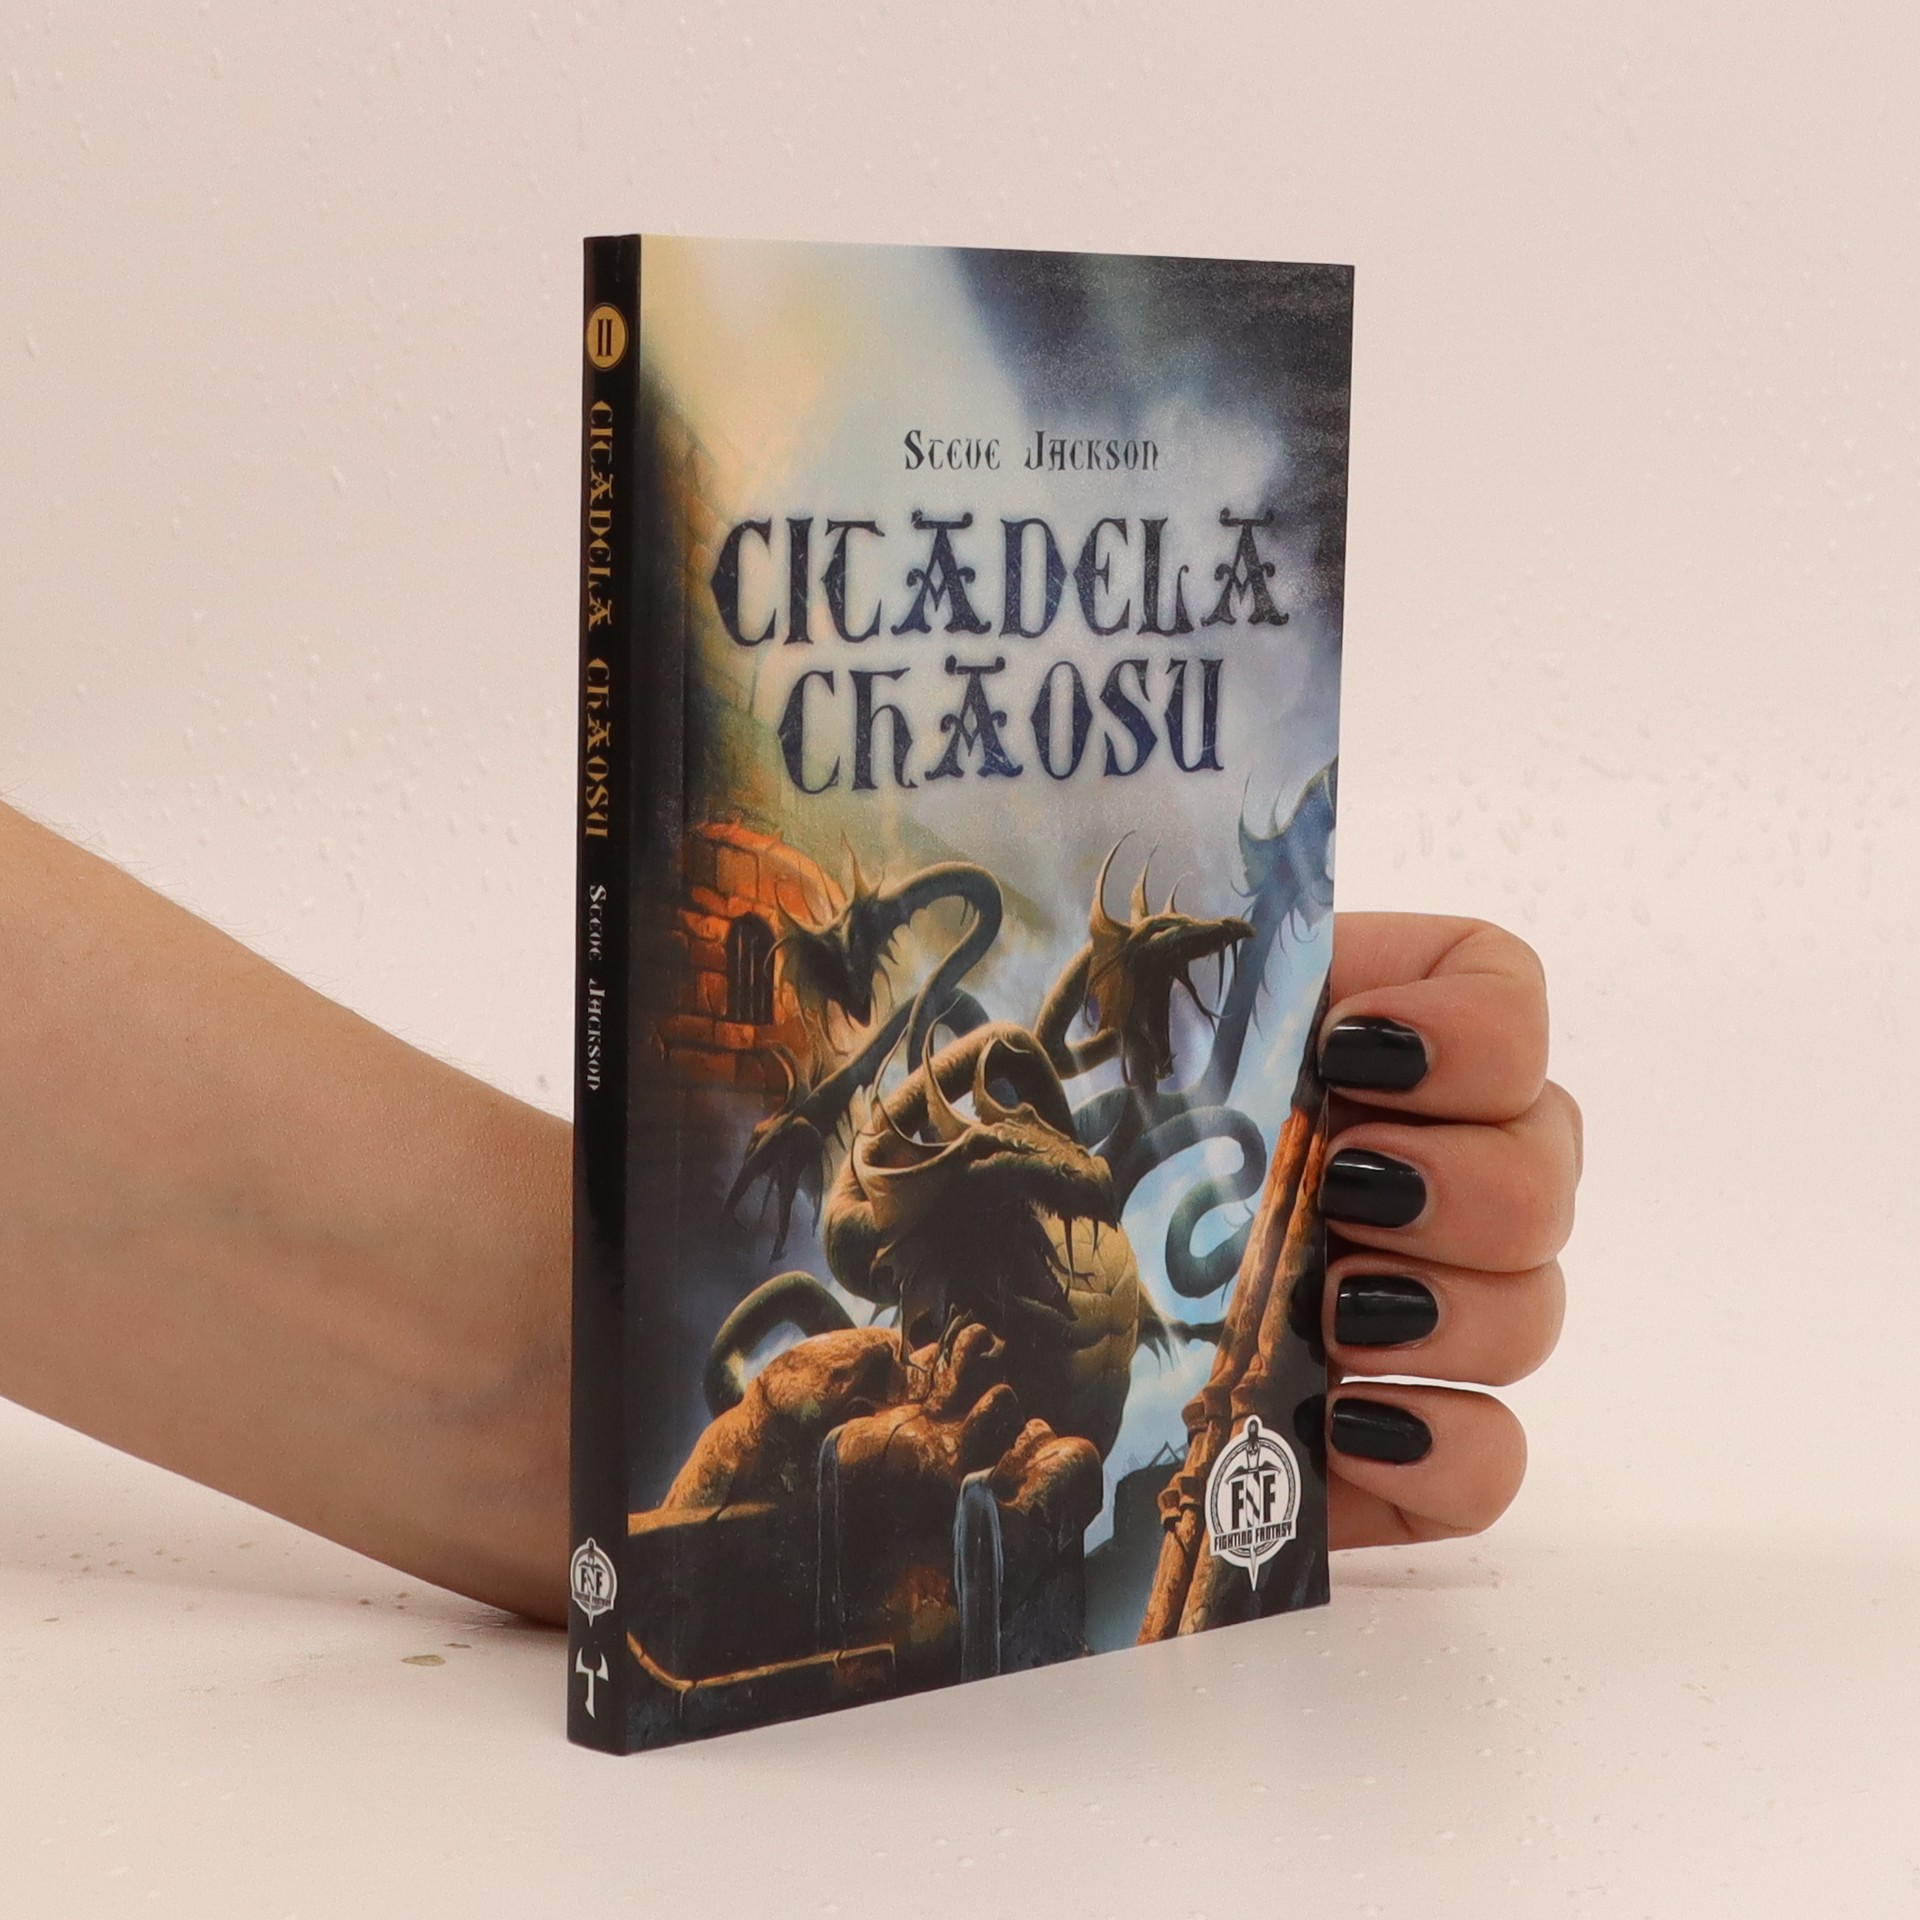 antikvární kniha Citadela chaosu, 2016